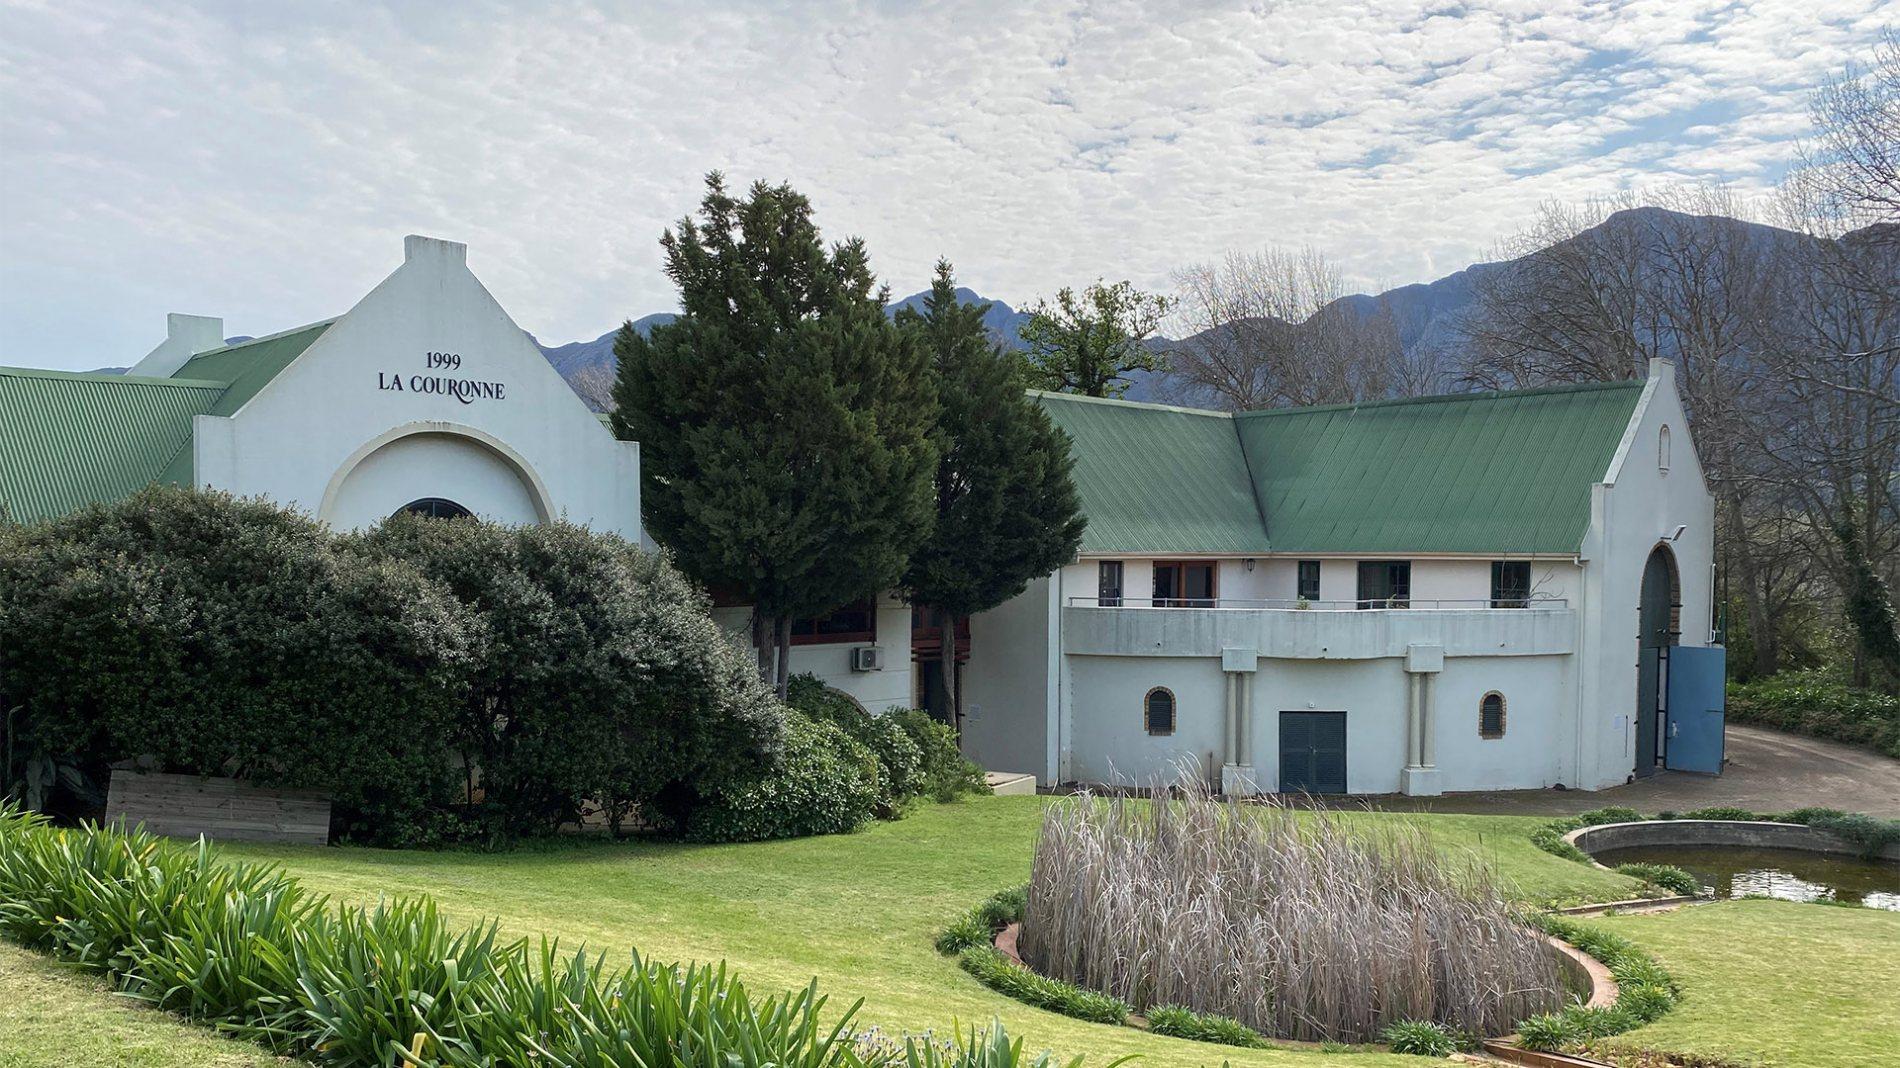 Franschhoek wine farm on auction through BidX1